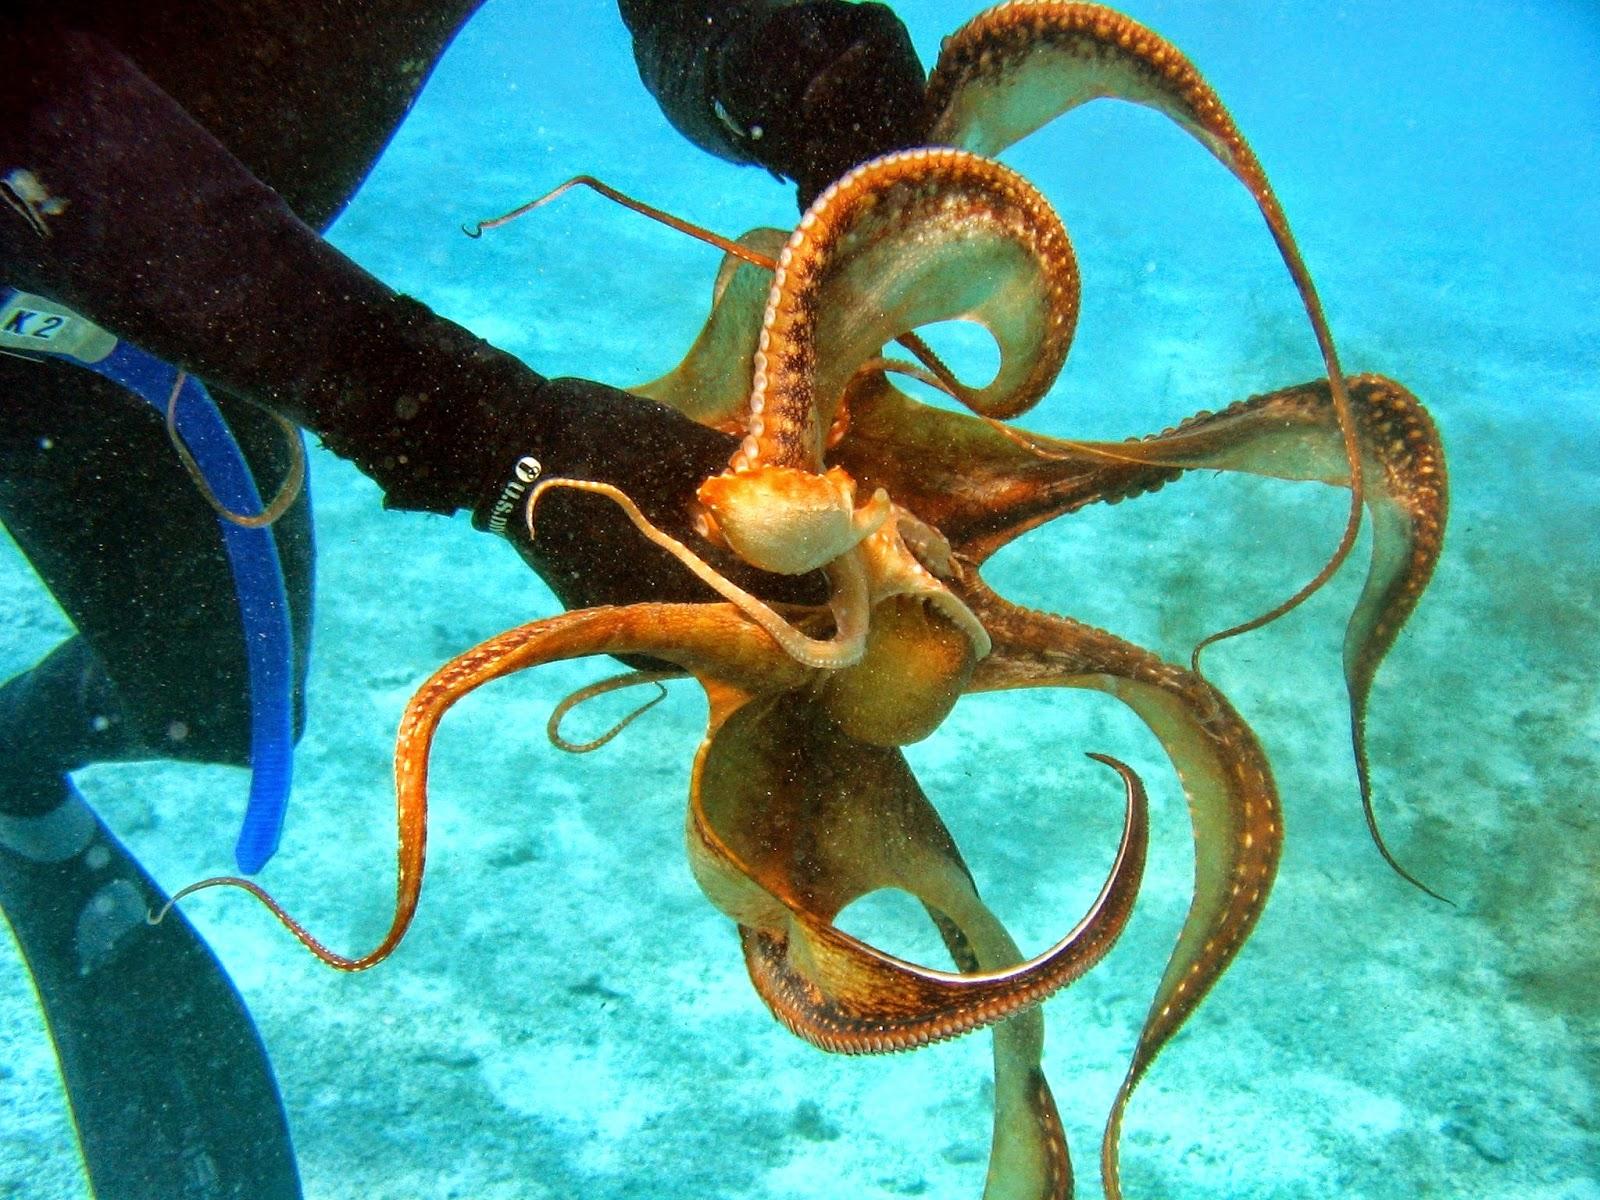 octopus 1080p hd